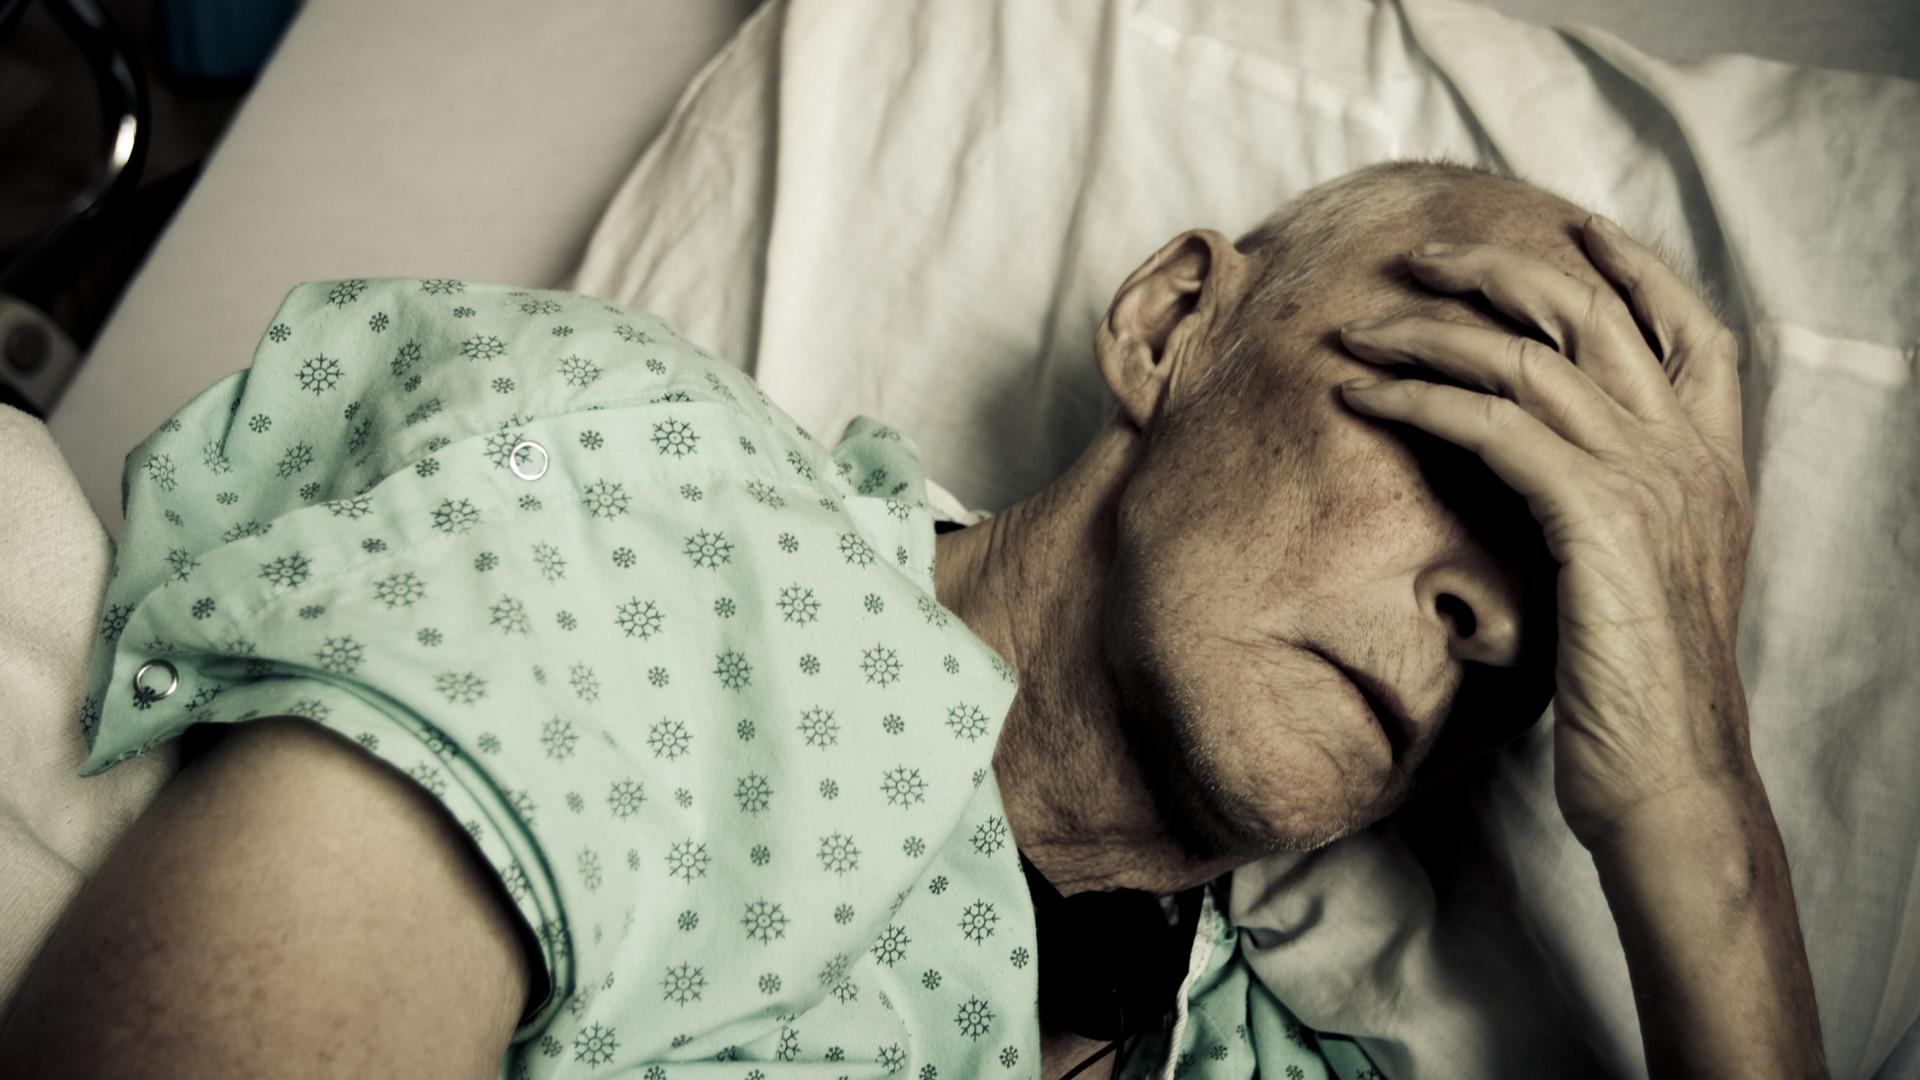 tumor de próstata dolores